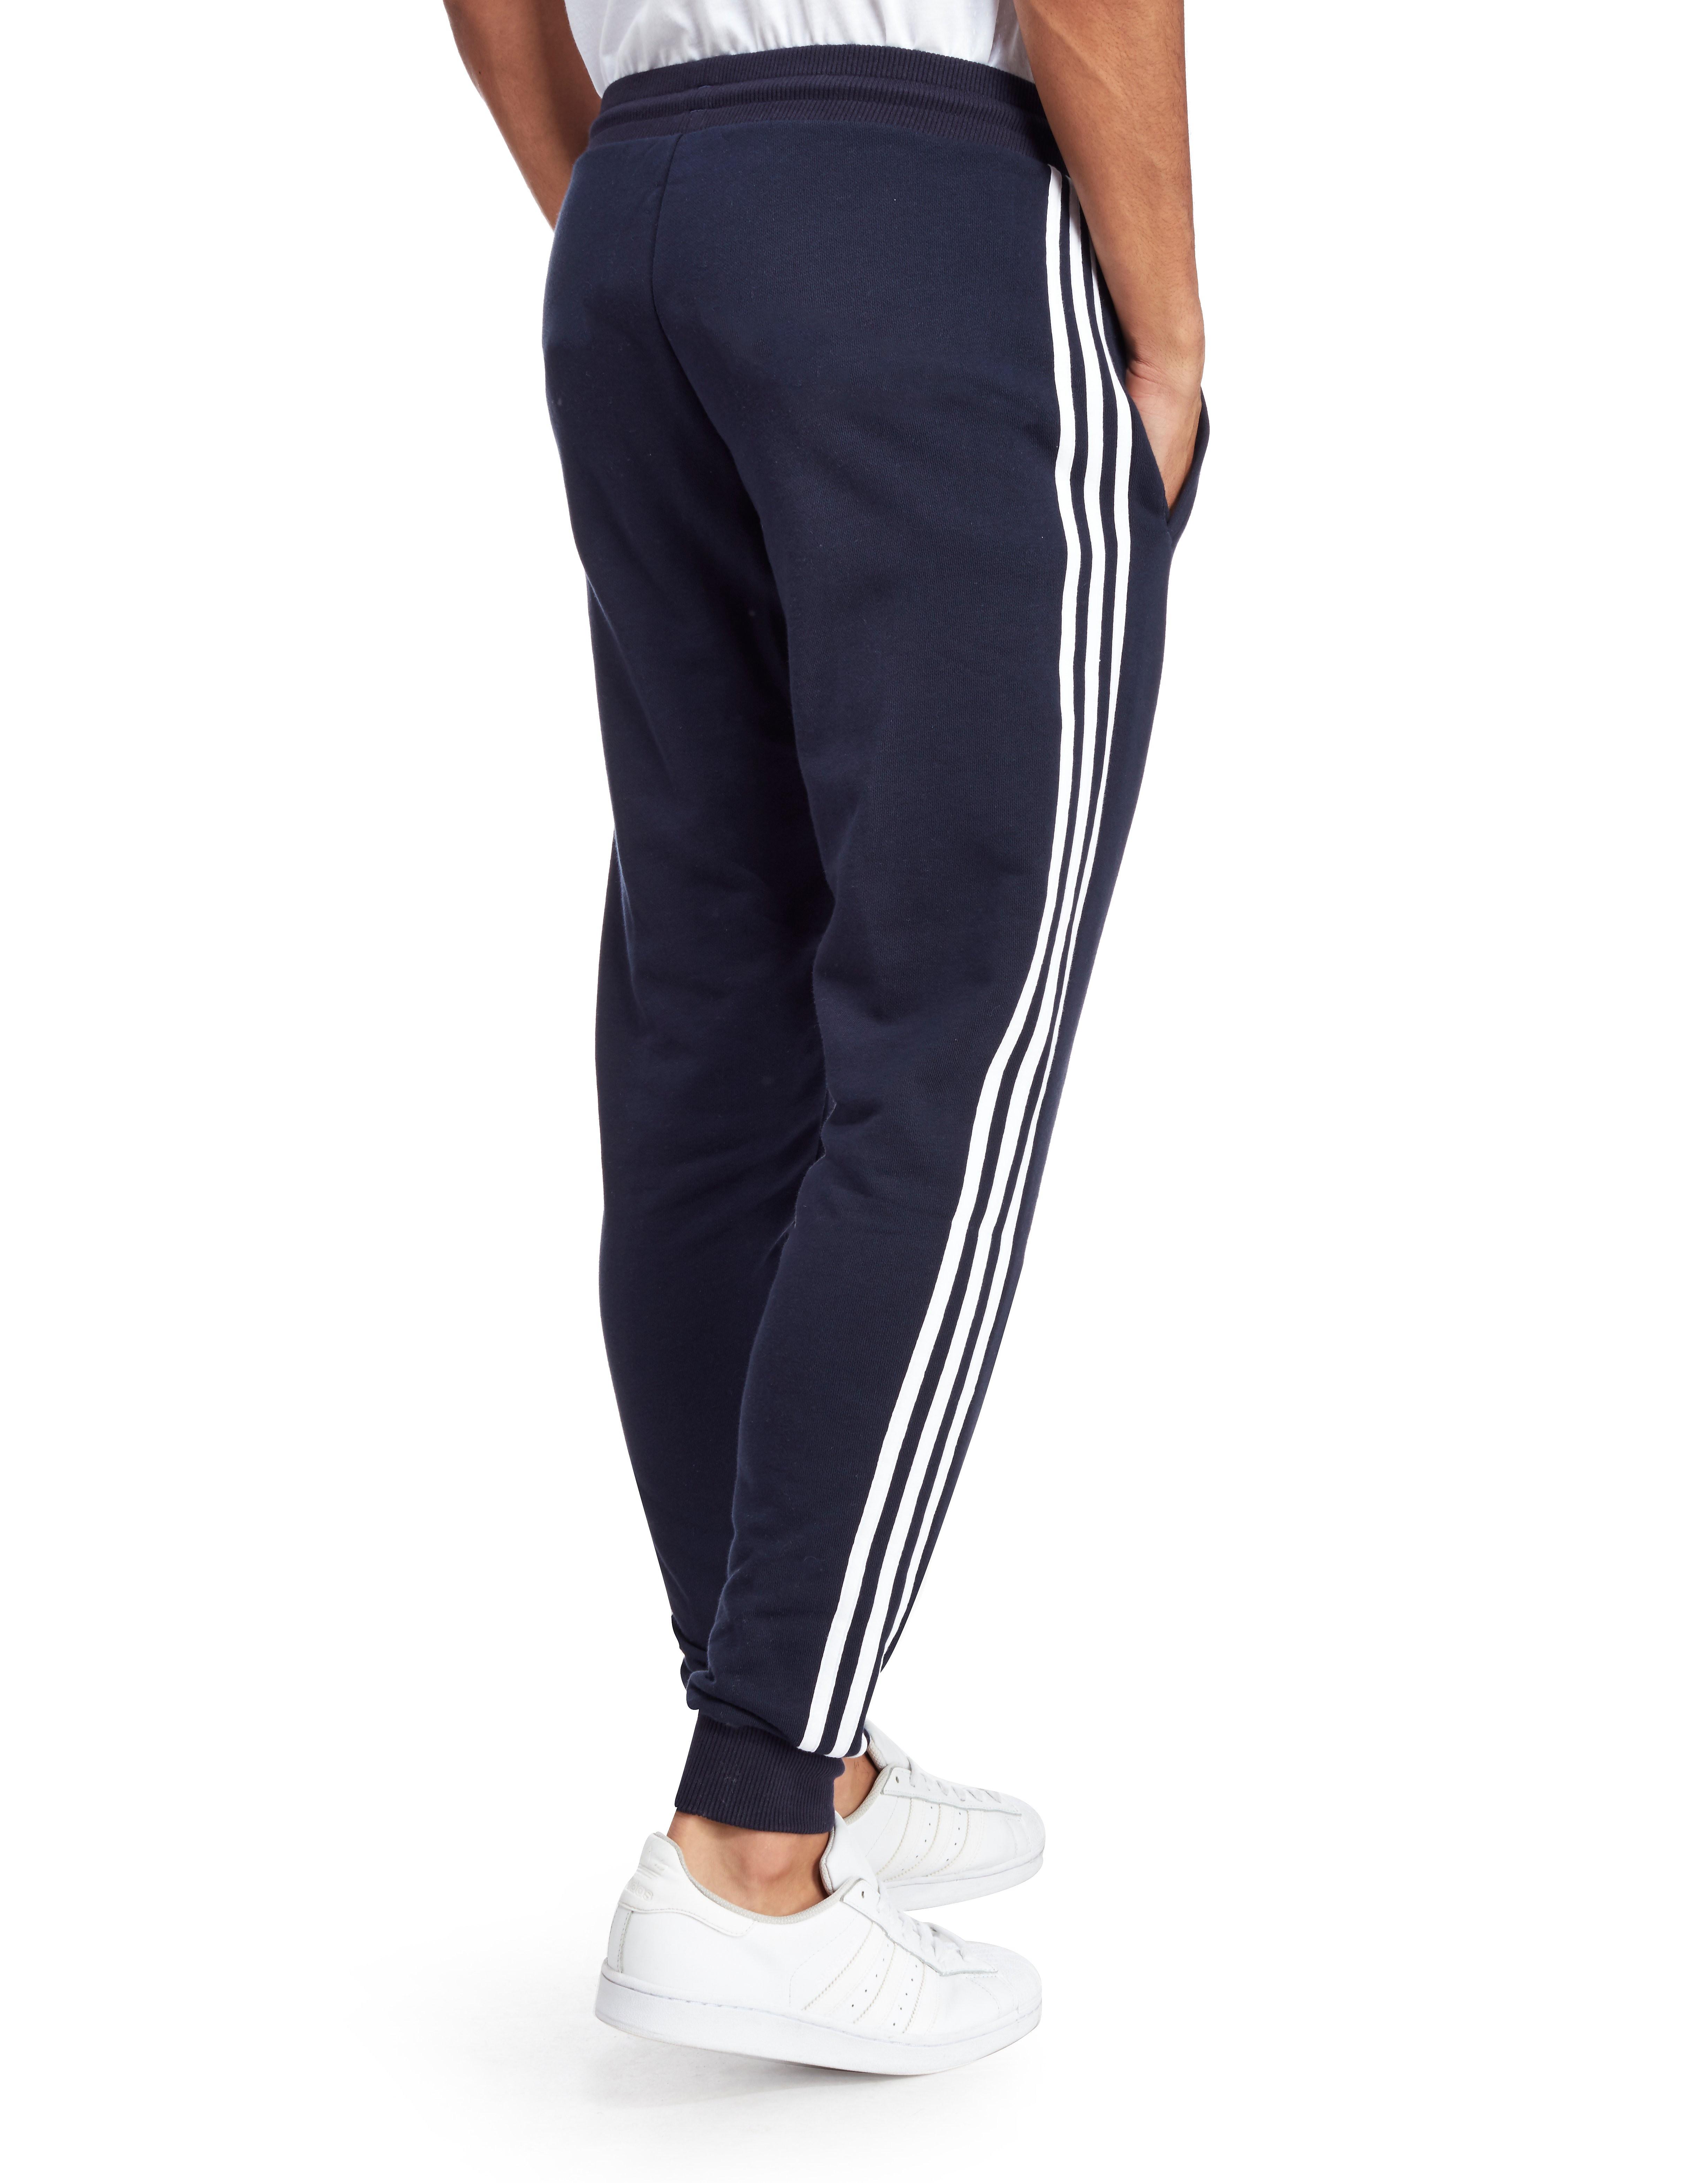 adidas Originals California Cuff Pants